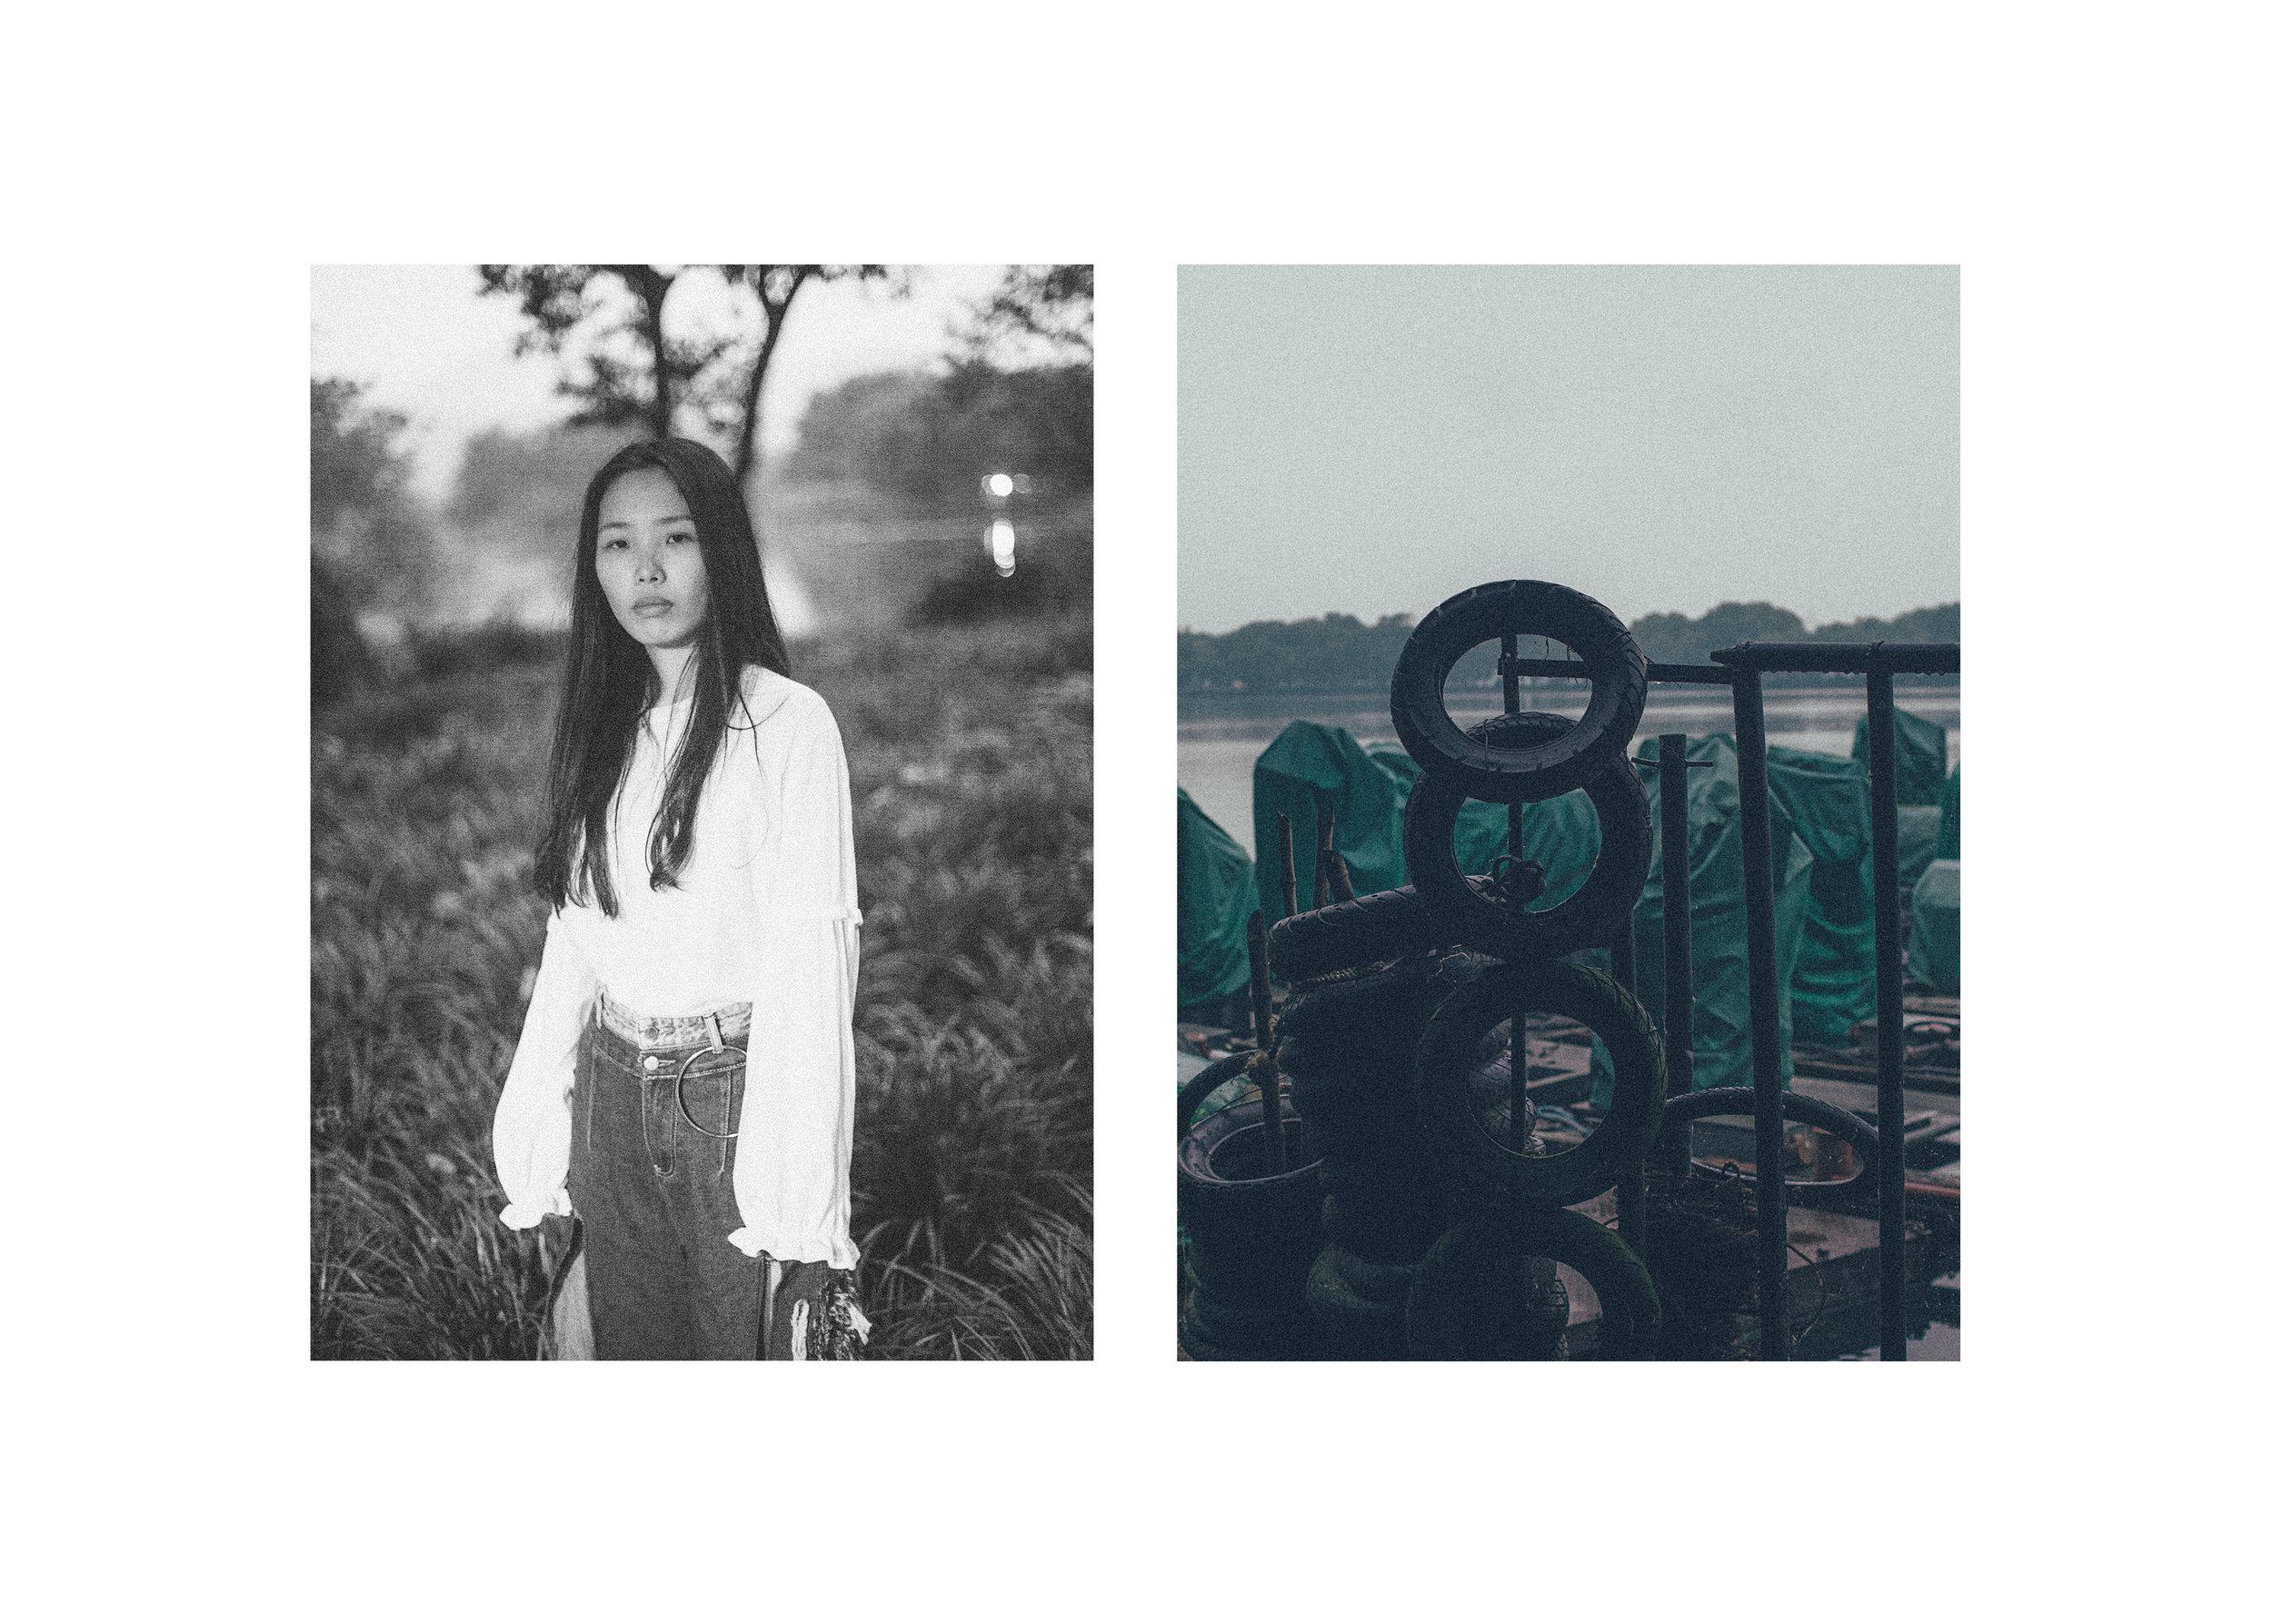 pascale-arnaud-xiaotong-2016-photography-of-china-6.jpg